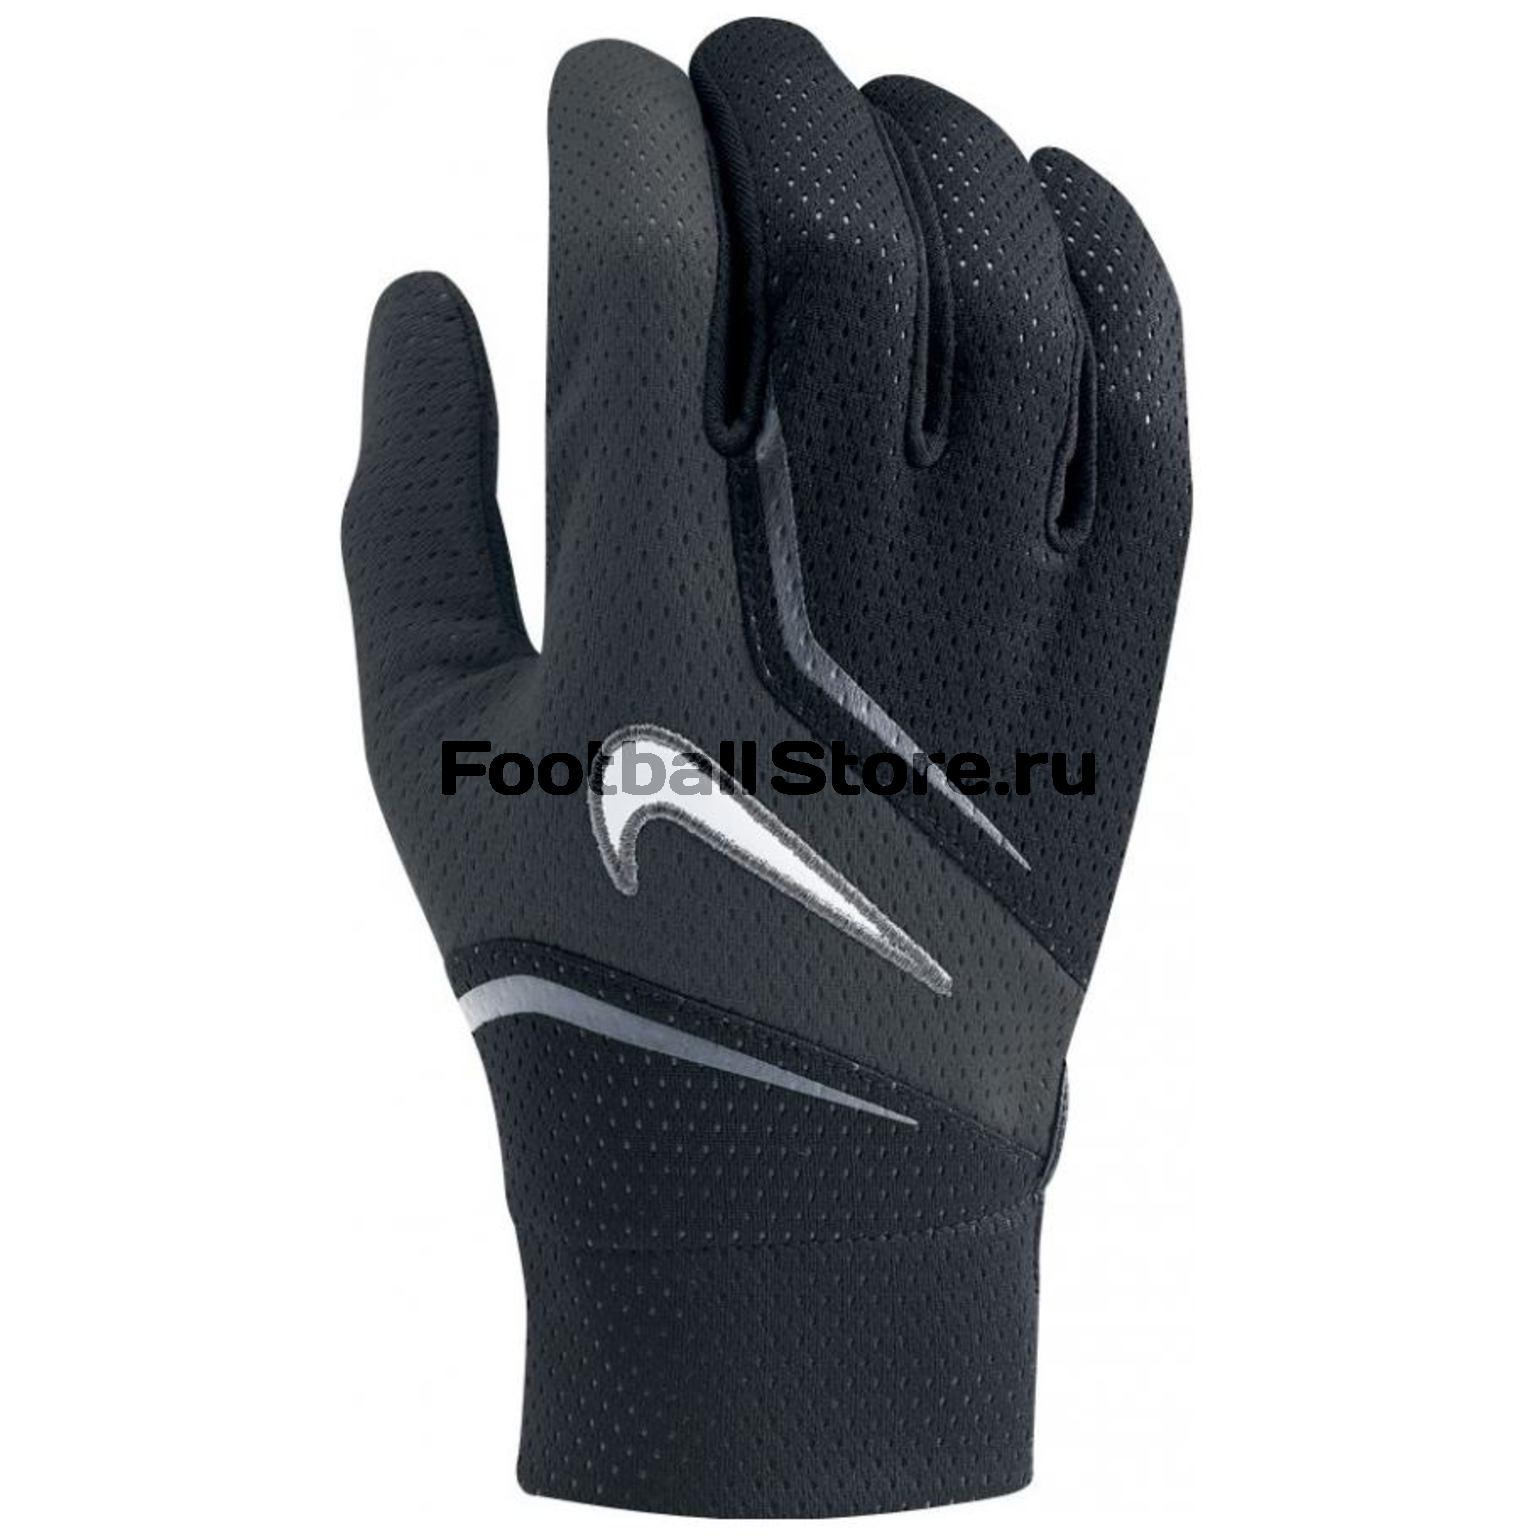 Перчатки Nike Перчатки трен. Nike Thermal Field Players GLV GS0224-031